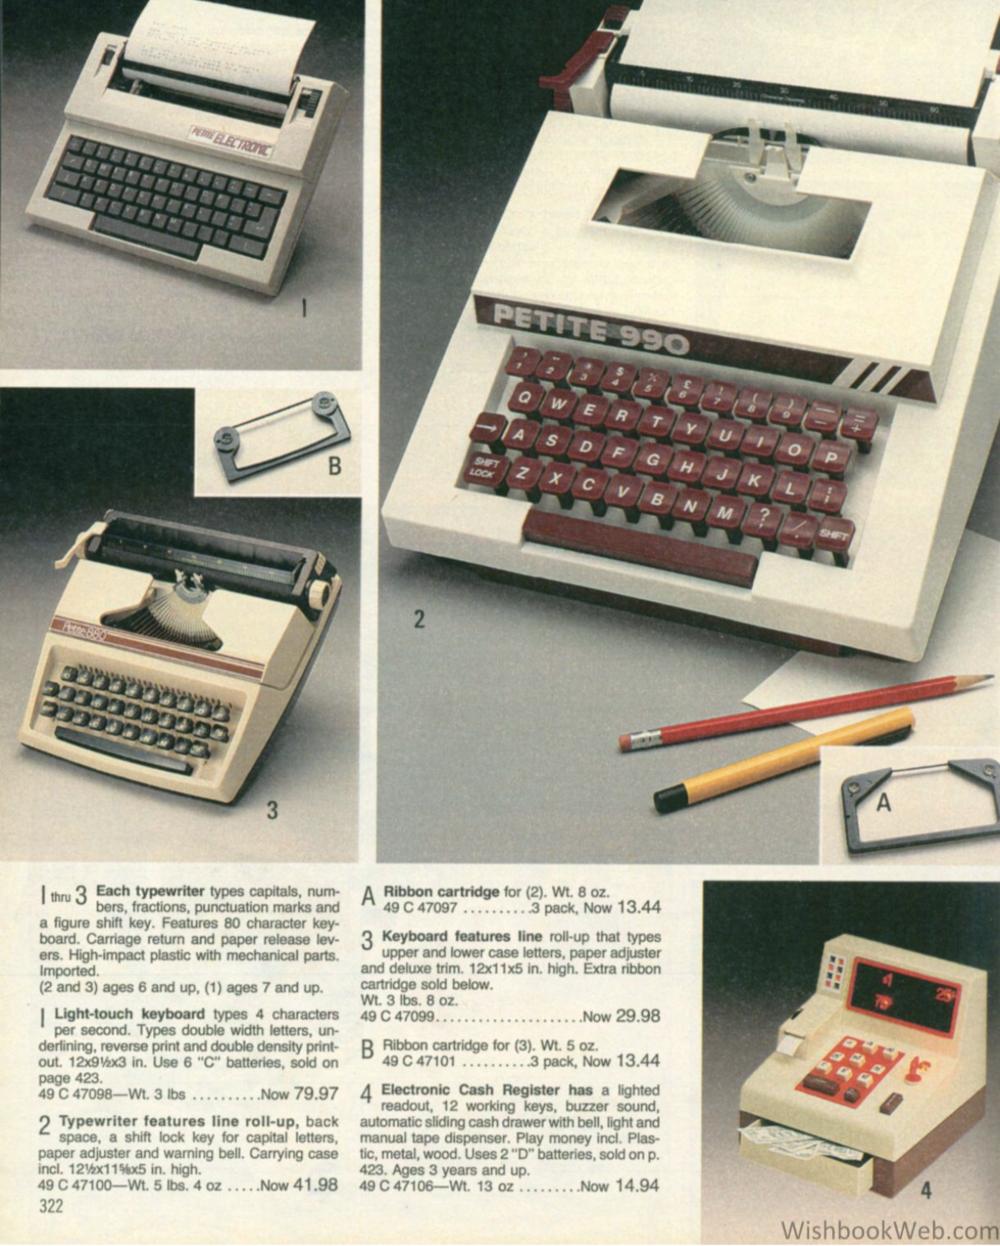 Nikki - Cash Register & Typewriter - wishbookweb.com